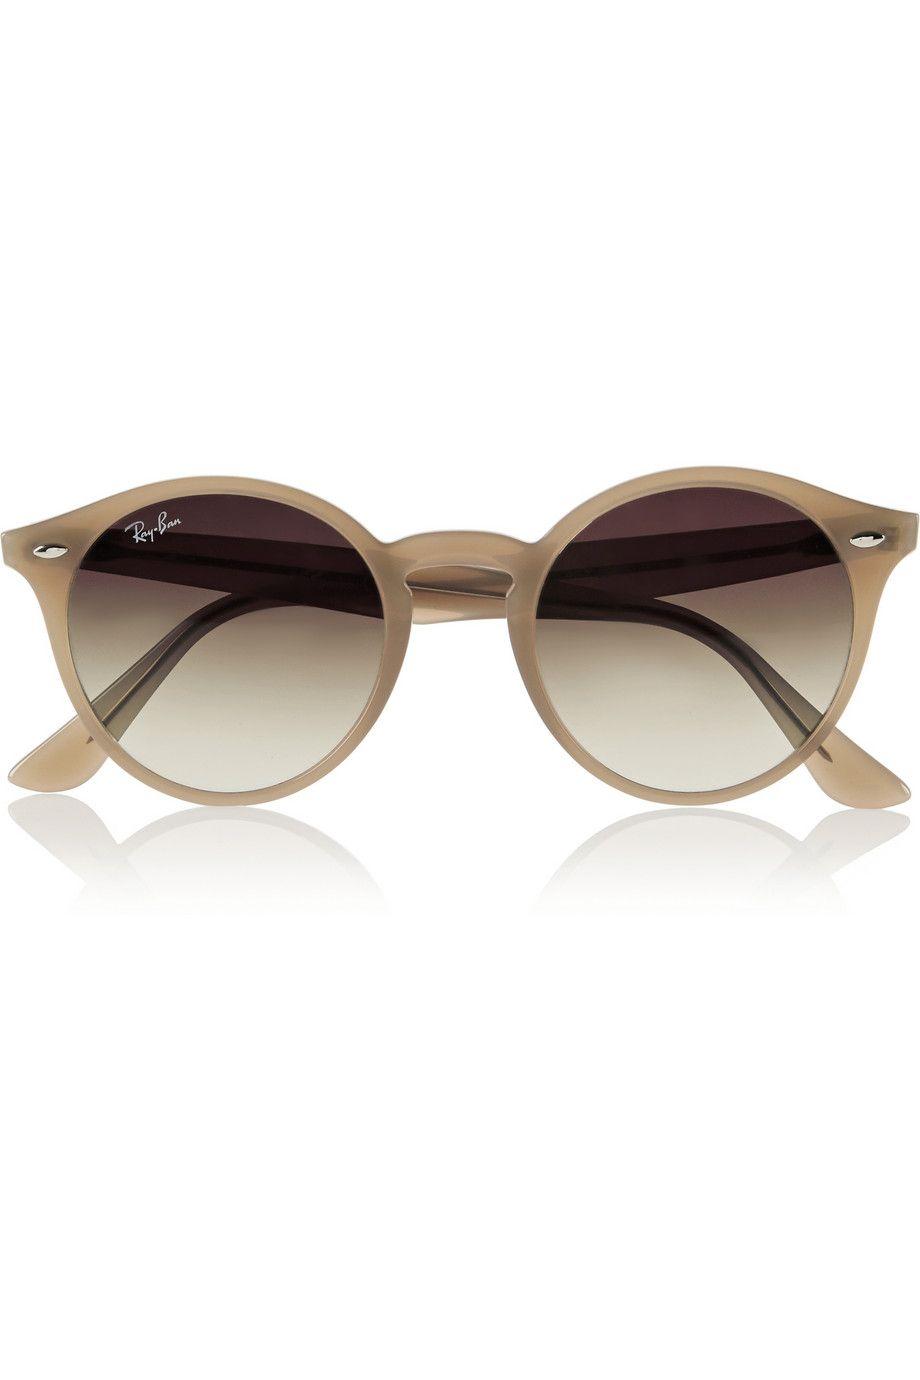 fc1ac03135 Ray-Ban - Round-frame acetate sunglasses